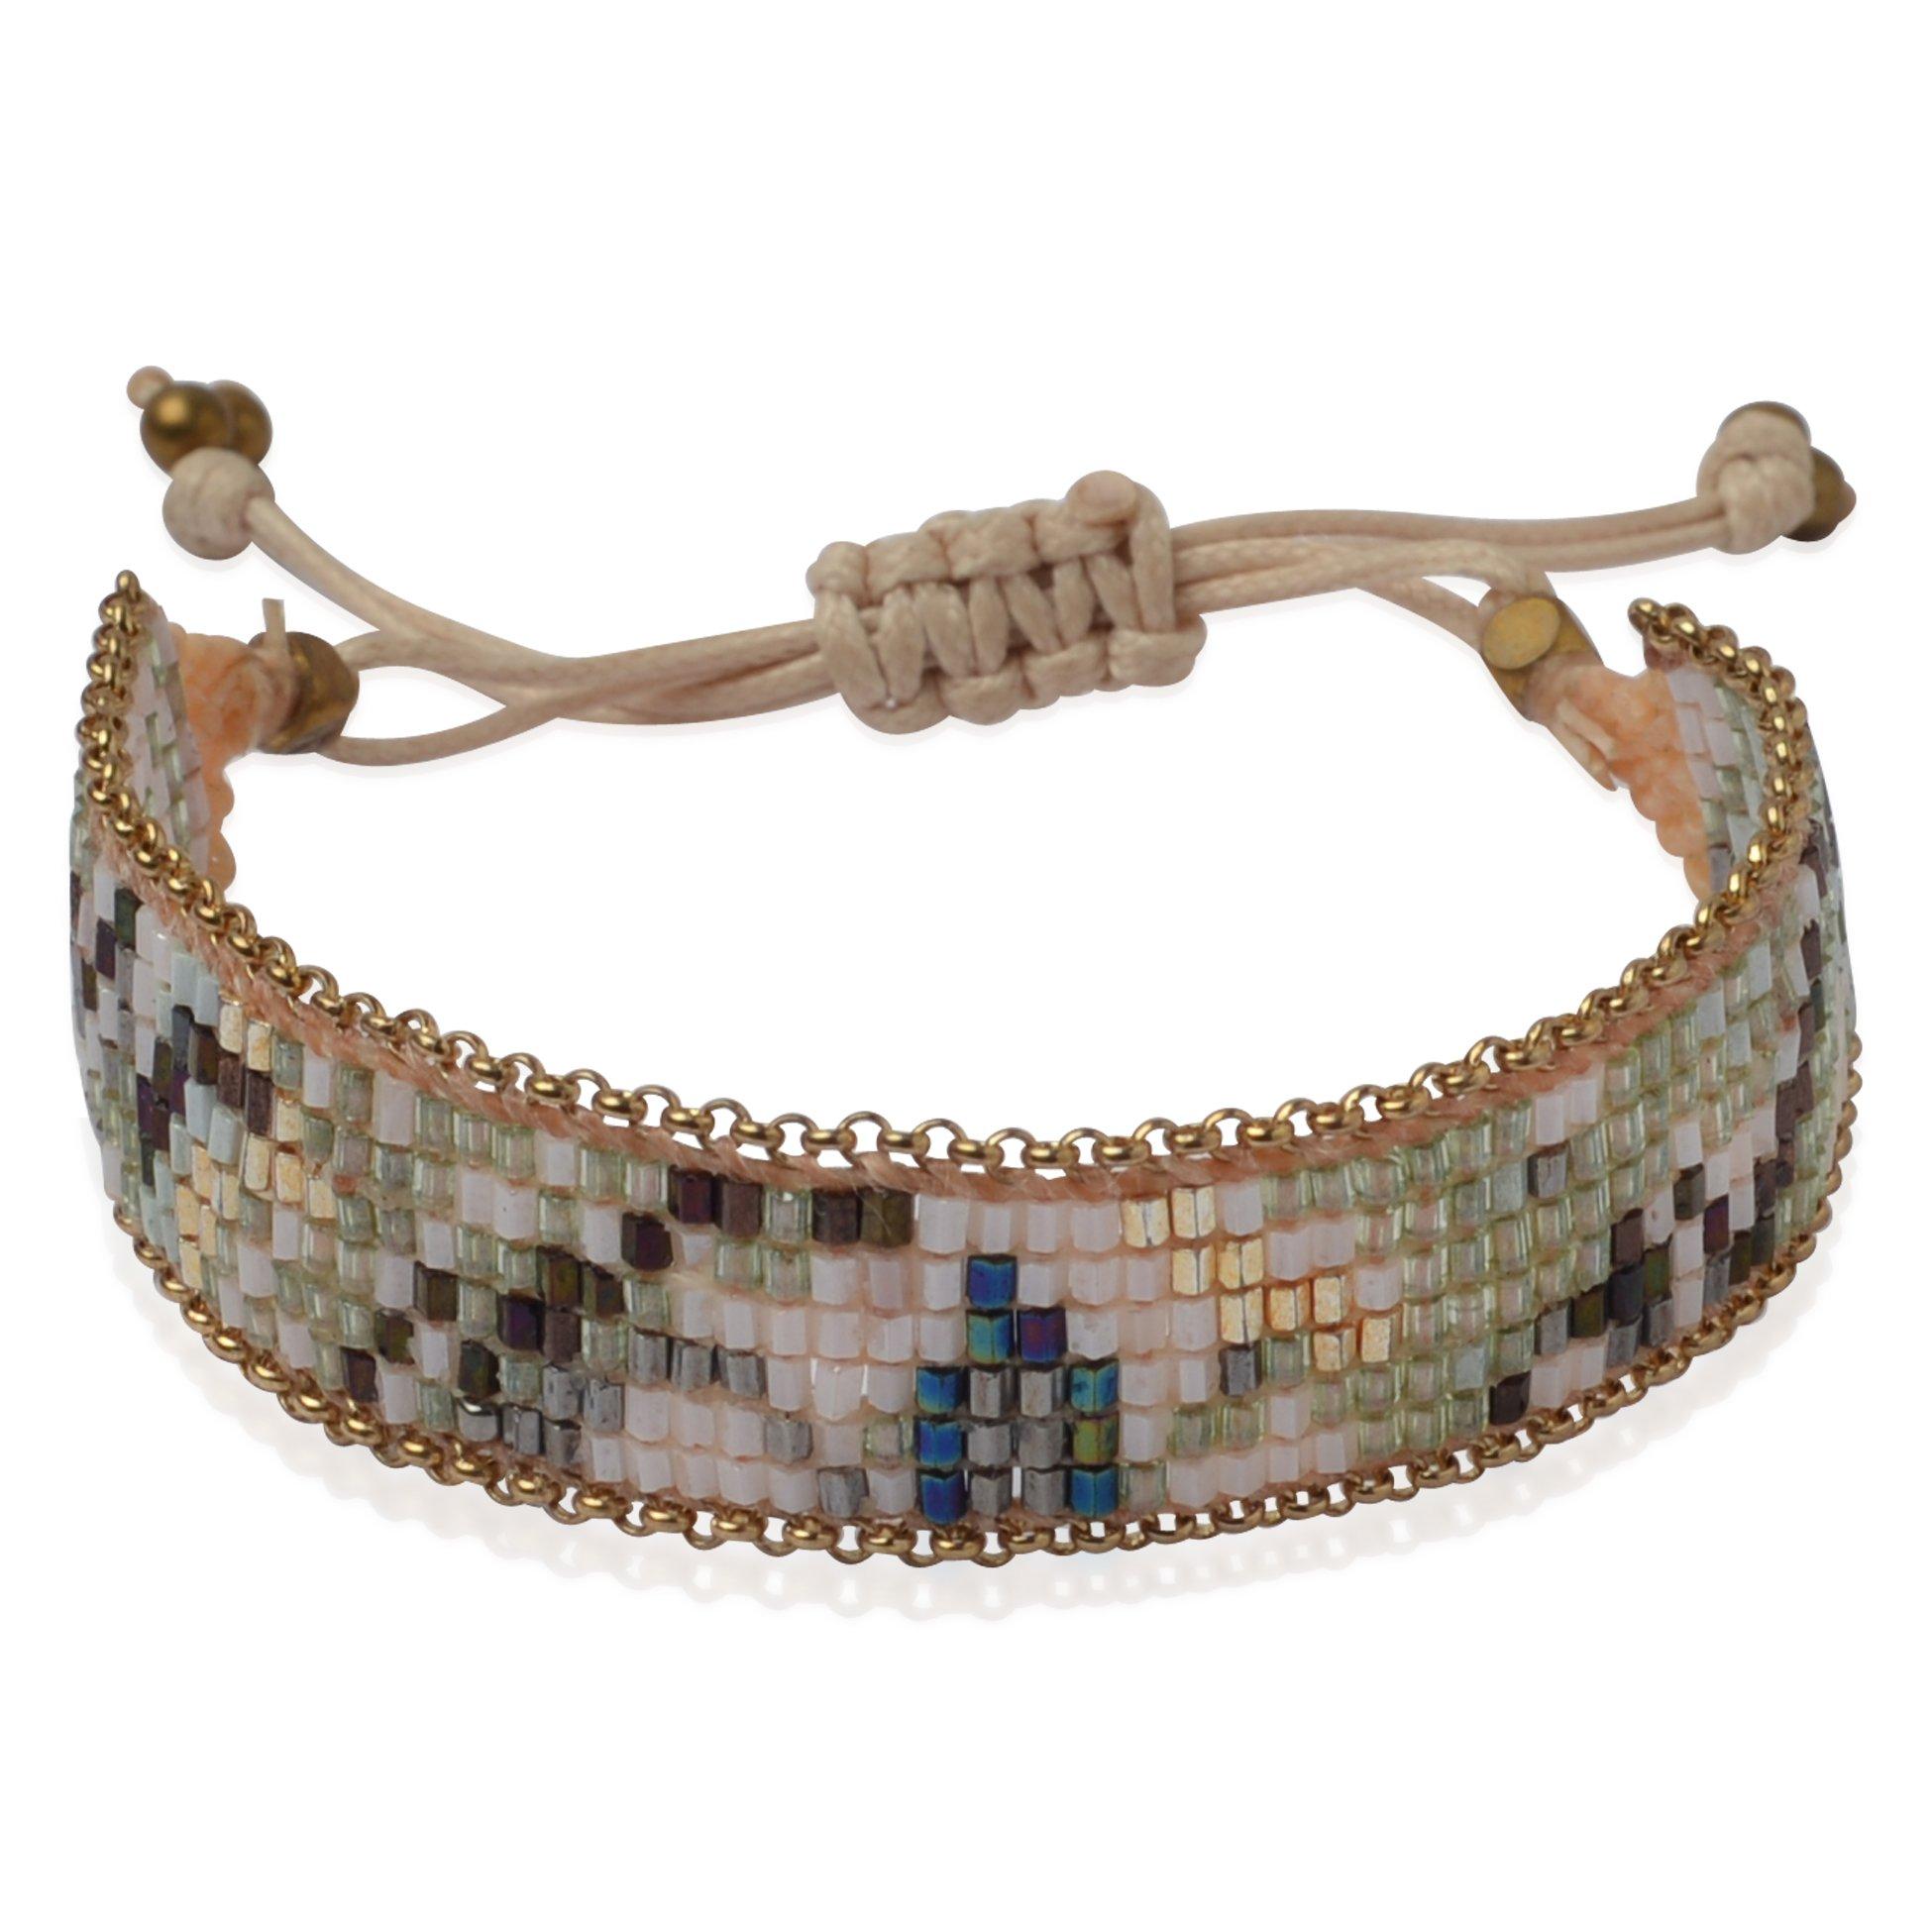 Joop Joop Handmade Crystal Camo Boho Beaded Single Wrap Cuff Bracelet with Slider Opening